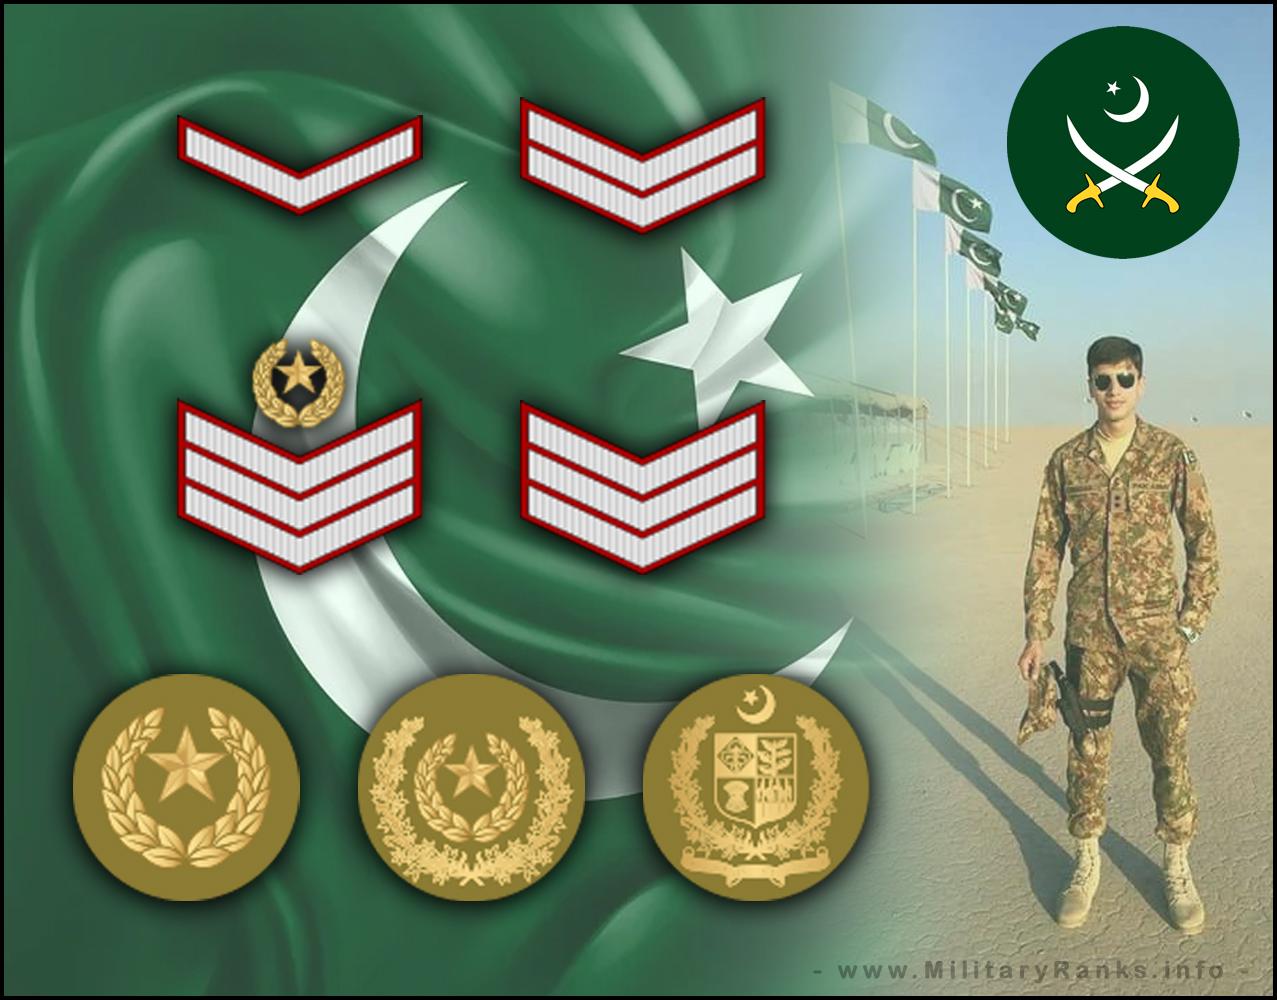 Pakistan Army Ranks and Insignia | Pakistan Army Ranks Insignia Badges